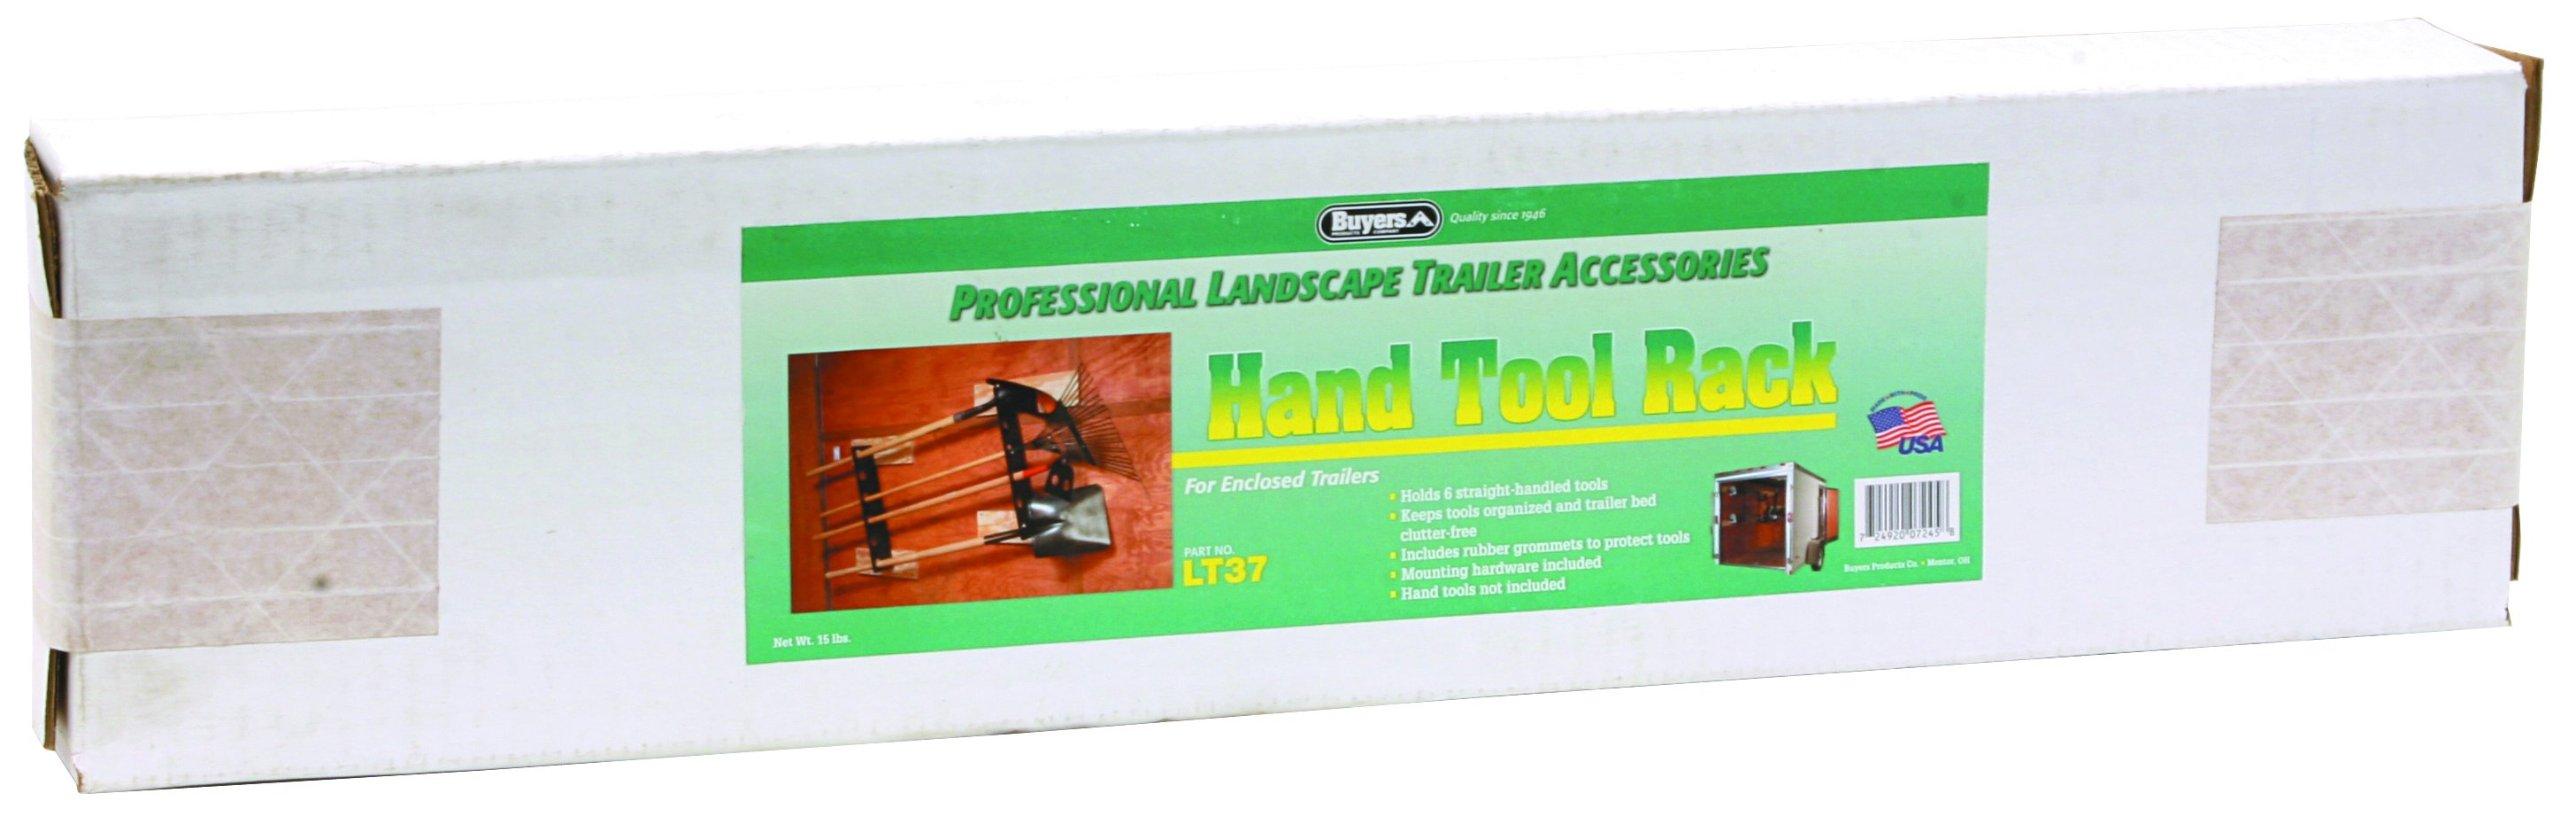 Buyers LT37 6-Tool Landscape Truck & Trailer Rack